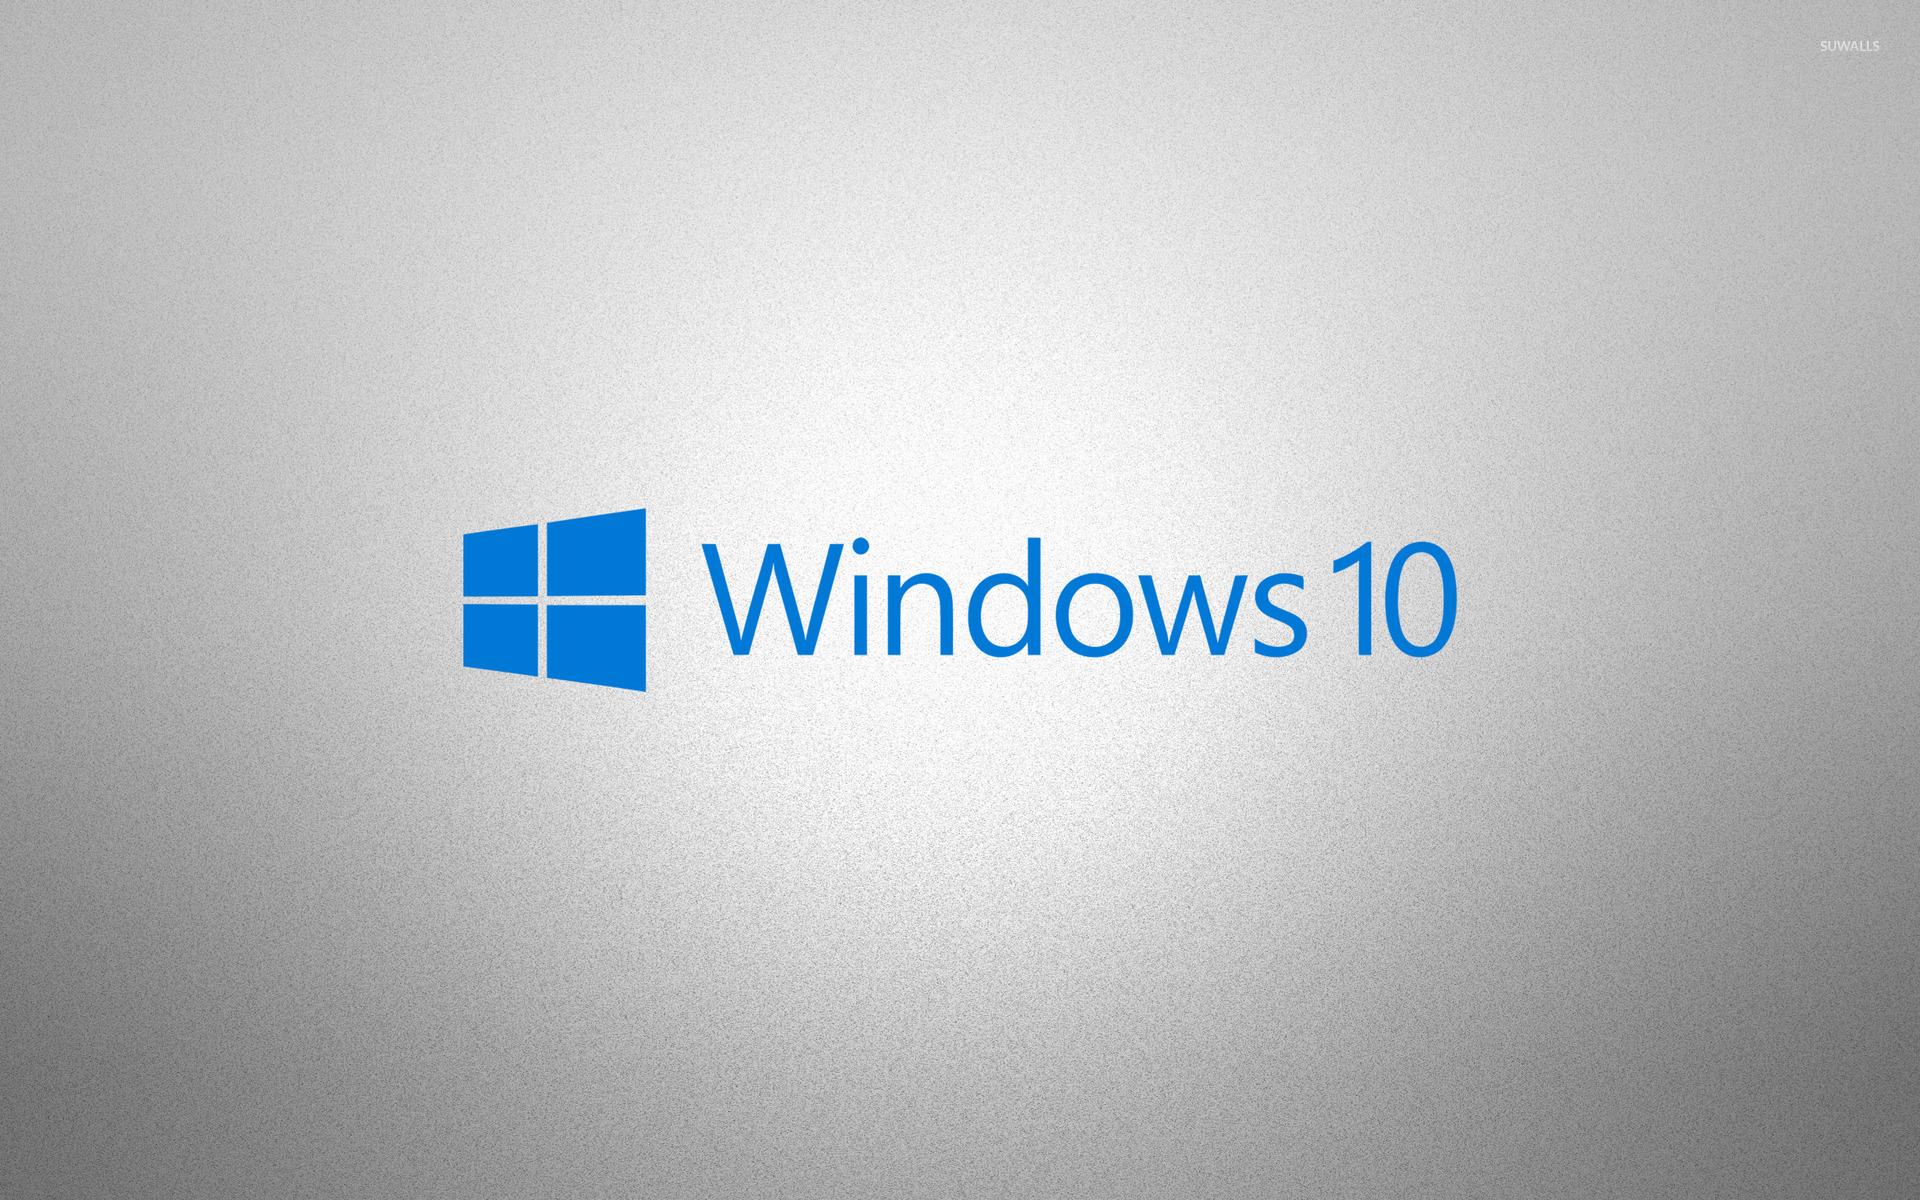 Windows 10 Blue Text Logo On Grainy Gray Wallpaper